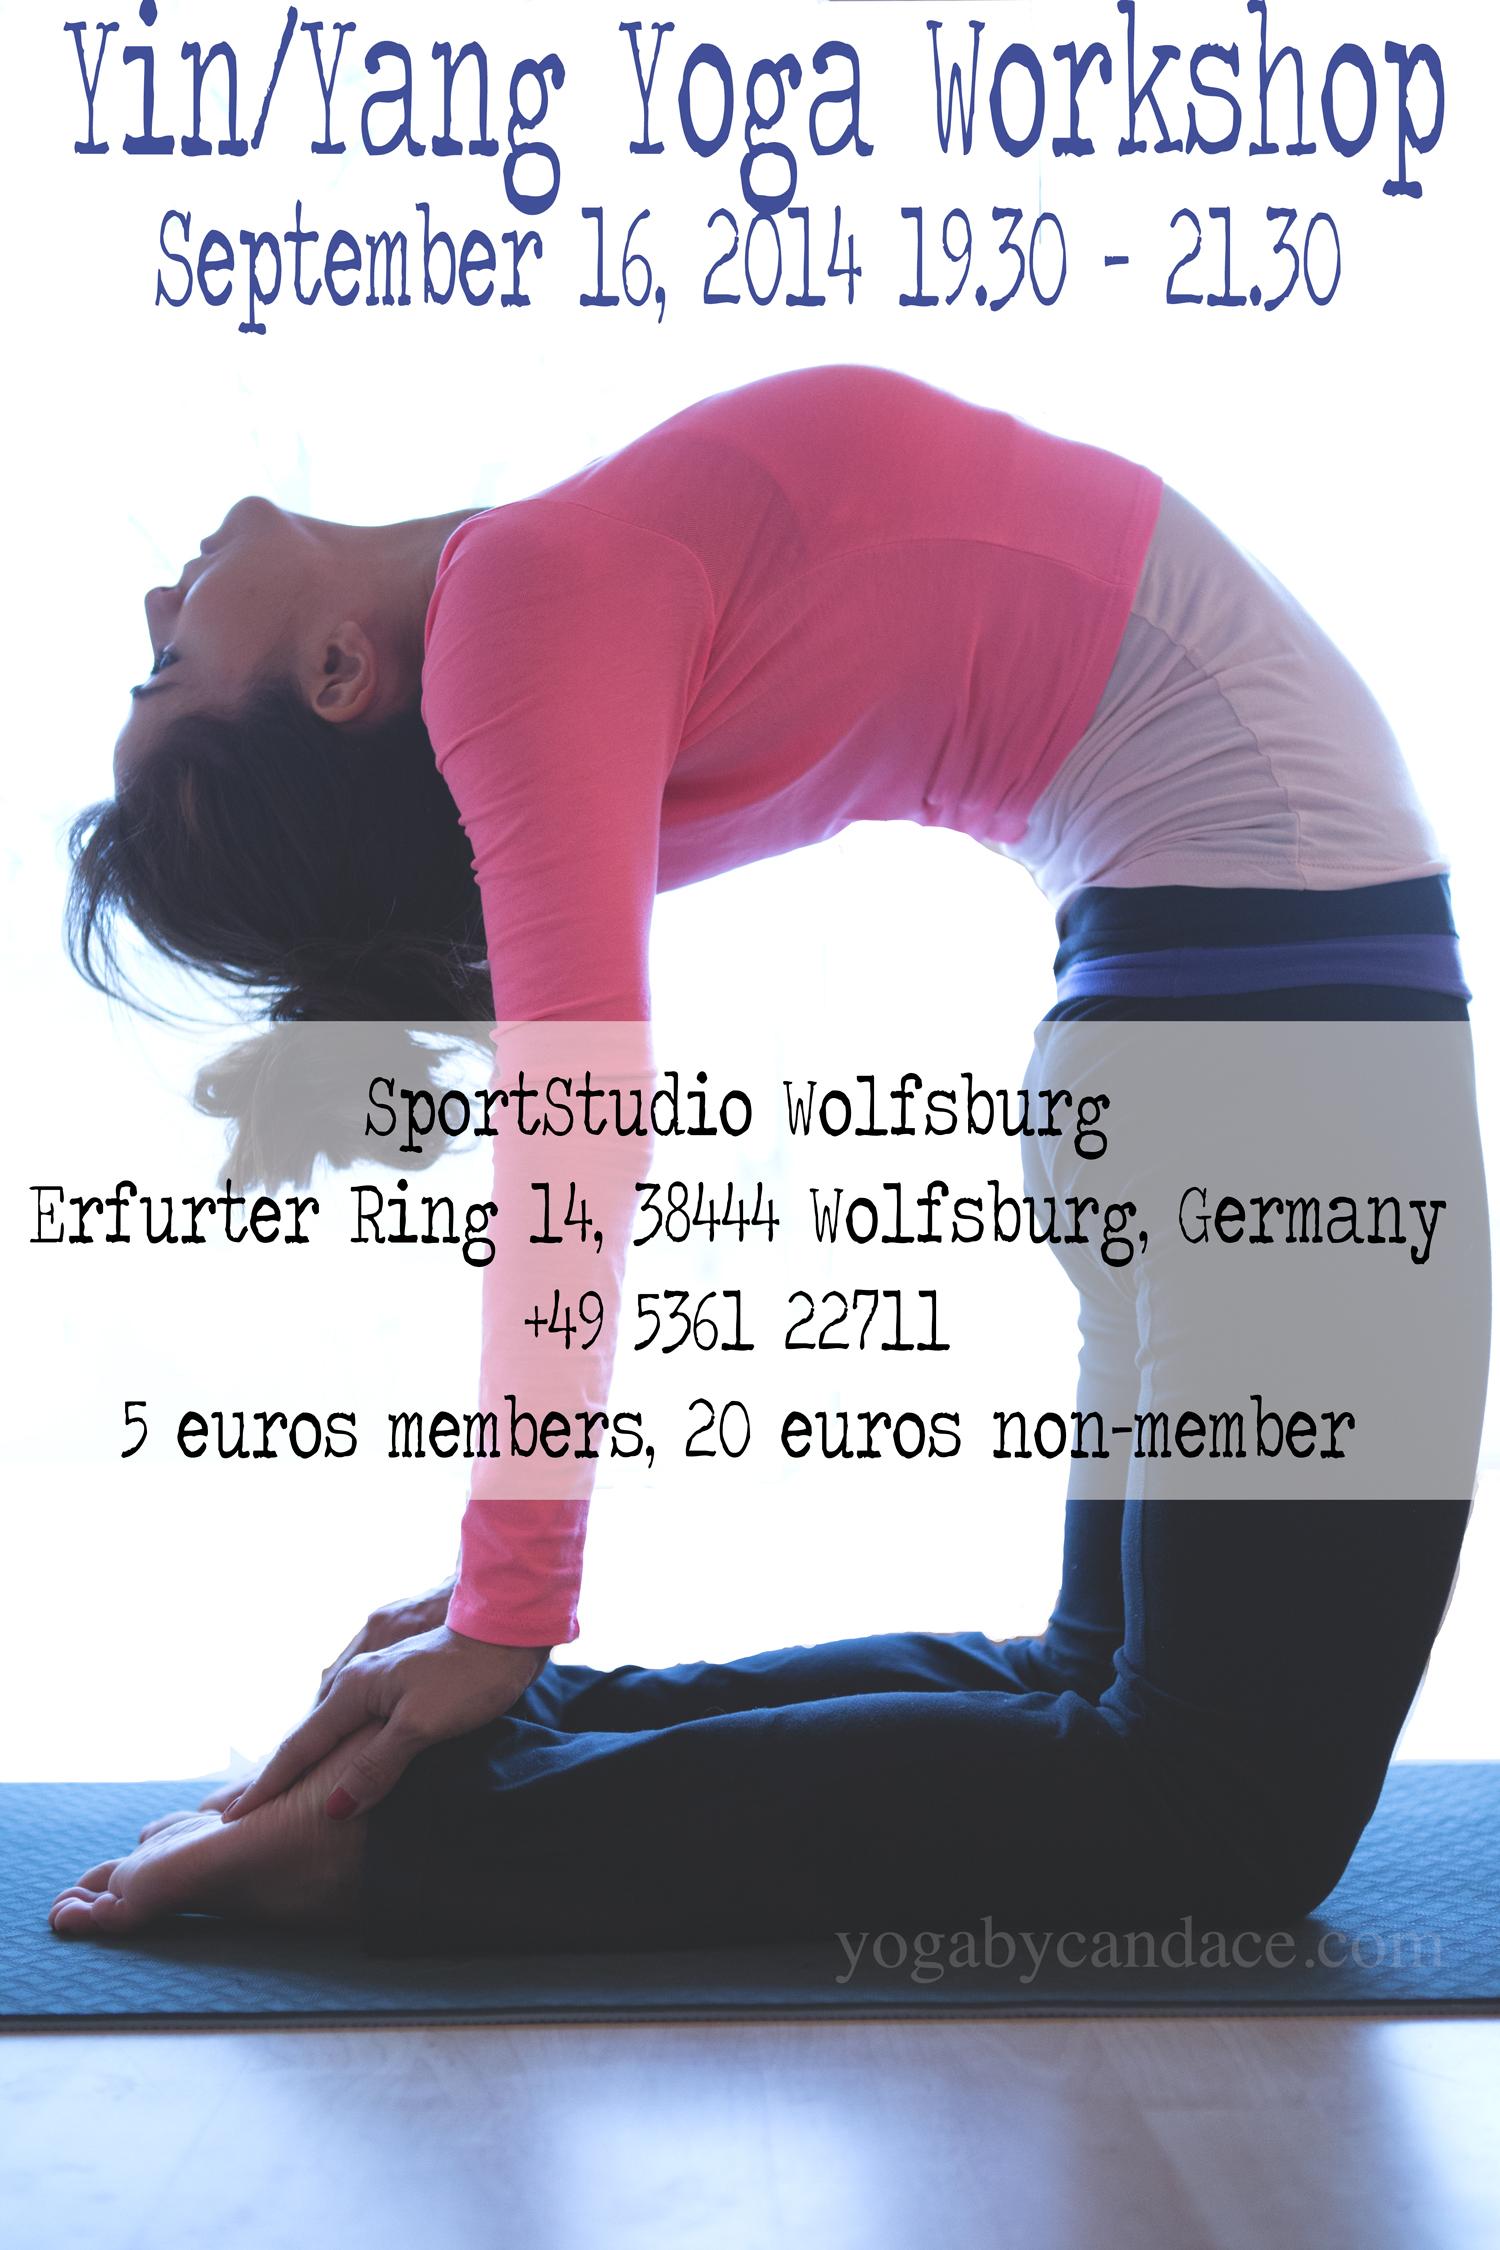 Yoga workshop in Germany